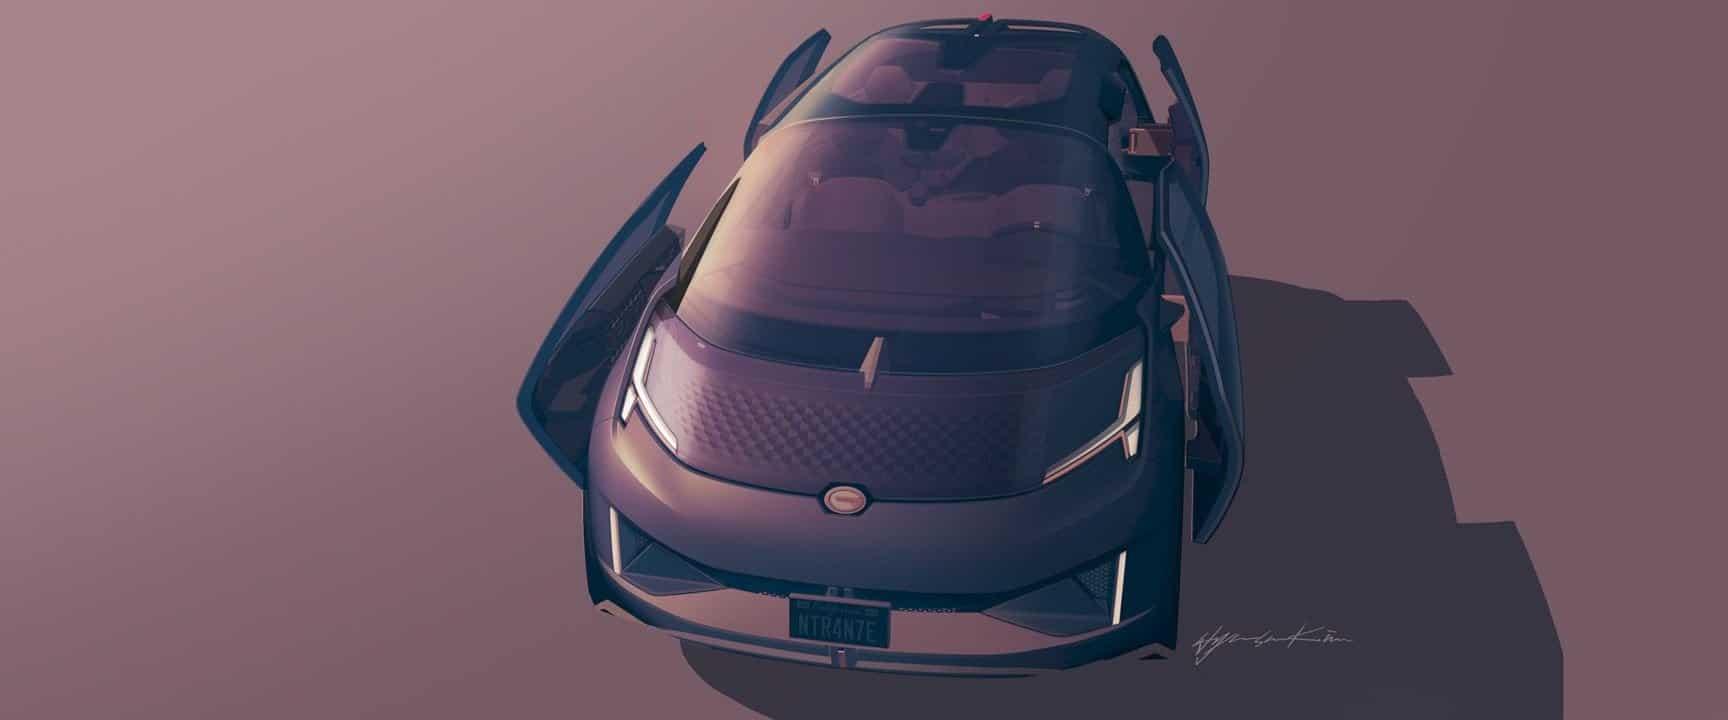 Gac Entranze Ev Concept 8